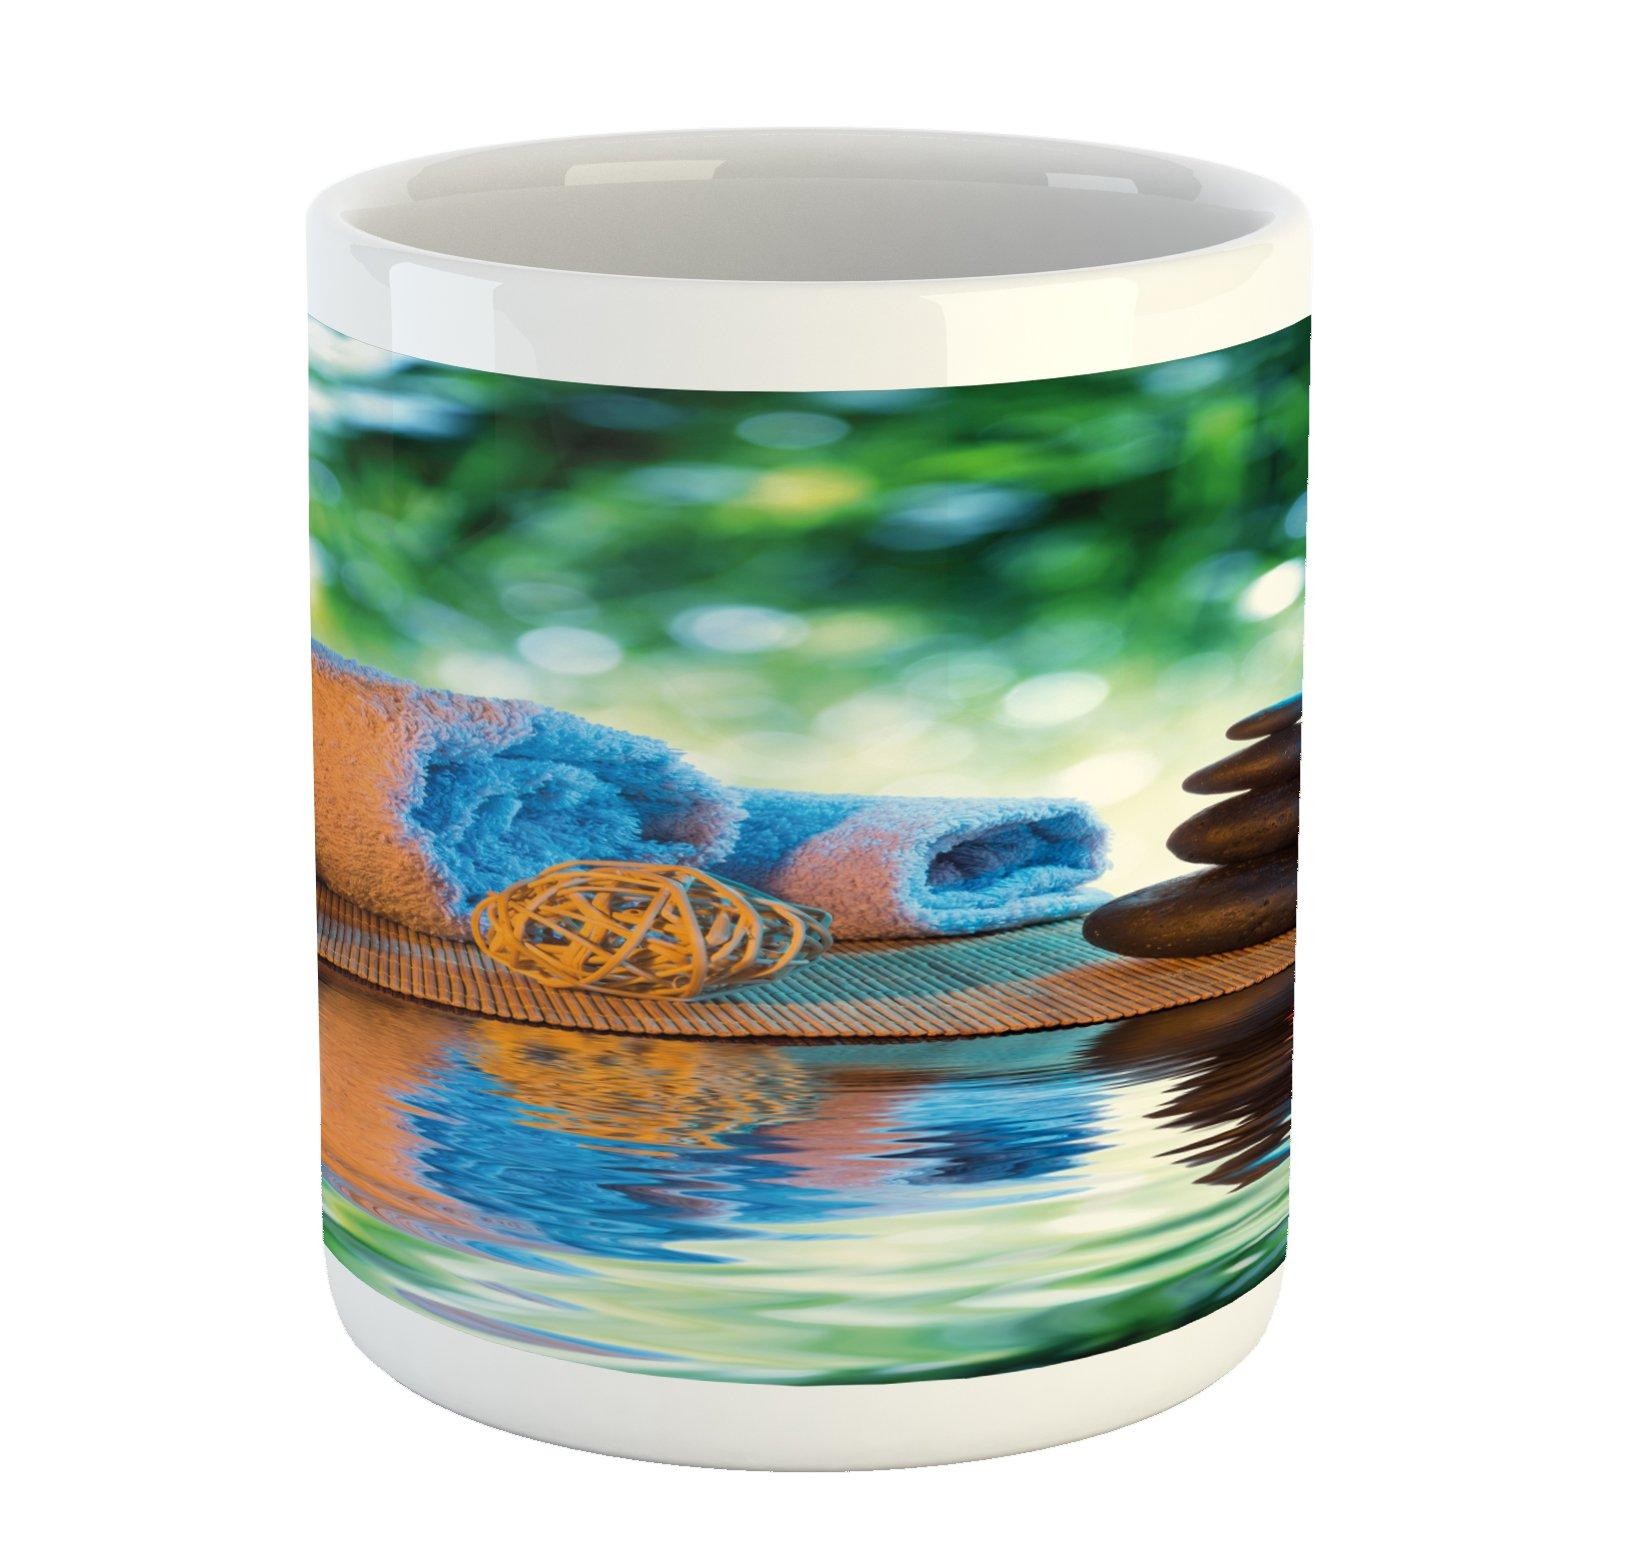 Lunarable Spa Mug, Asian Culture Inspiration Chinese Japanese Candles Zen Meditation Stones, Printed Ceramic Coffee Mug Water Tea Drinks Cup, Green Orange Lavander